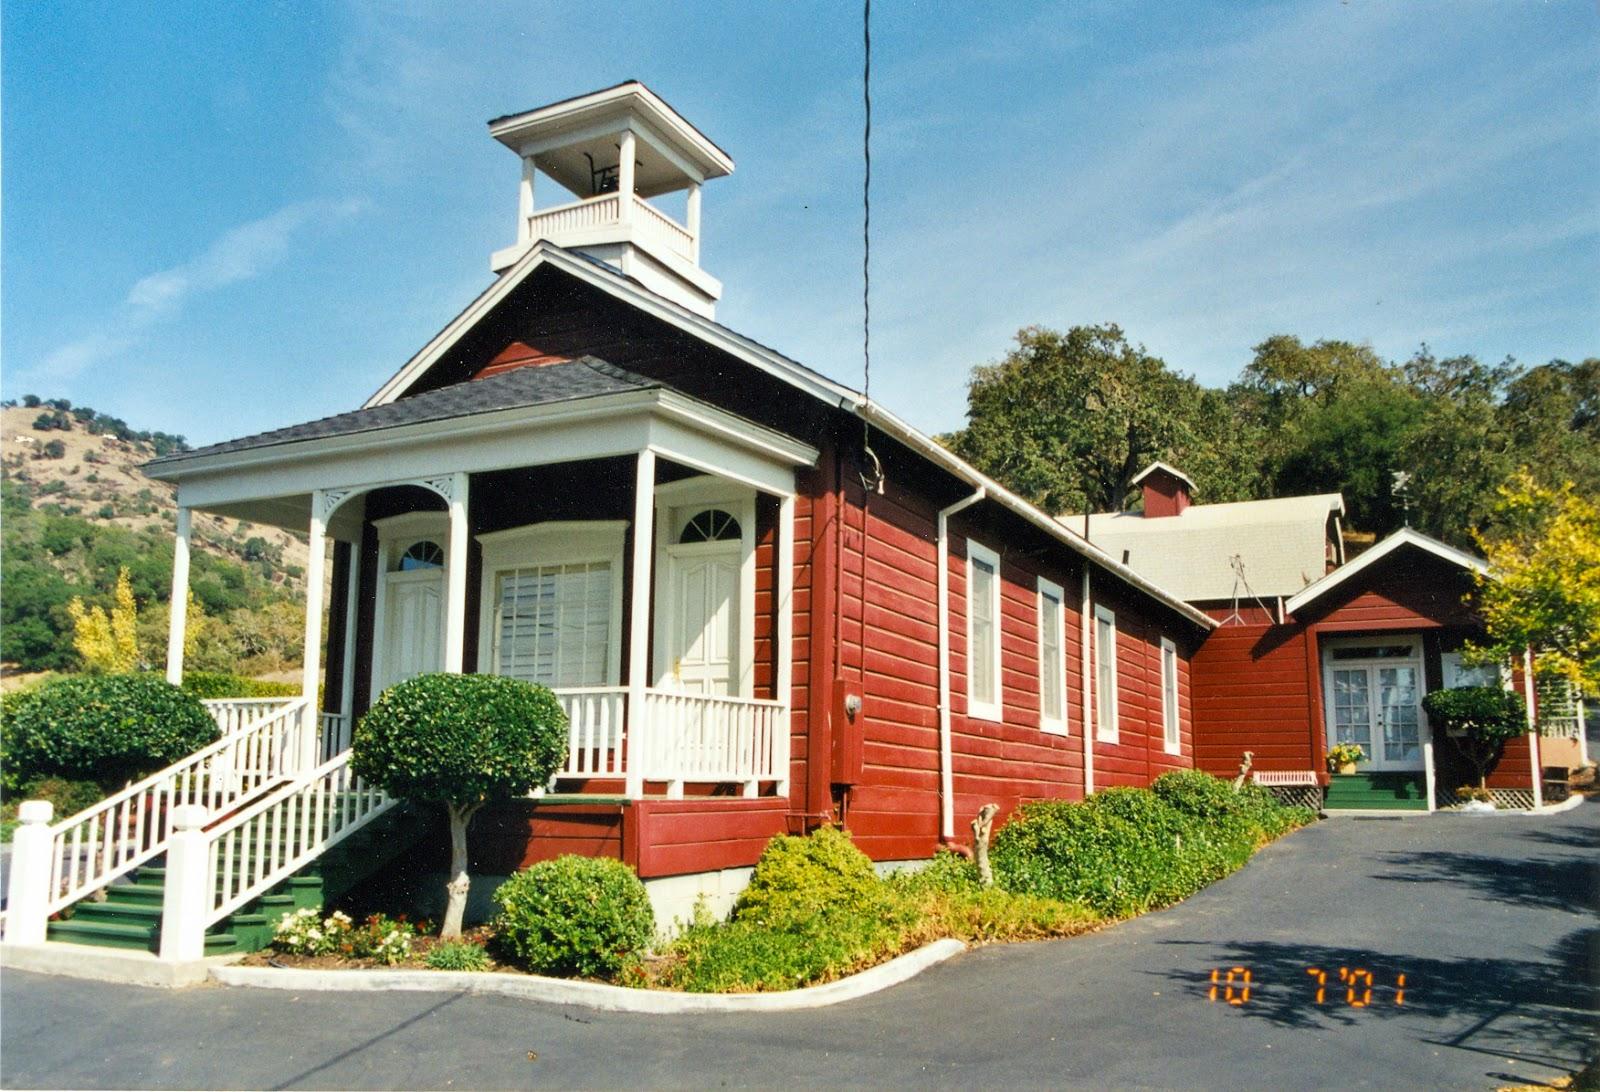 One room schoolhouse on Silverado Trail in Napa